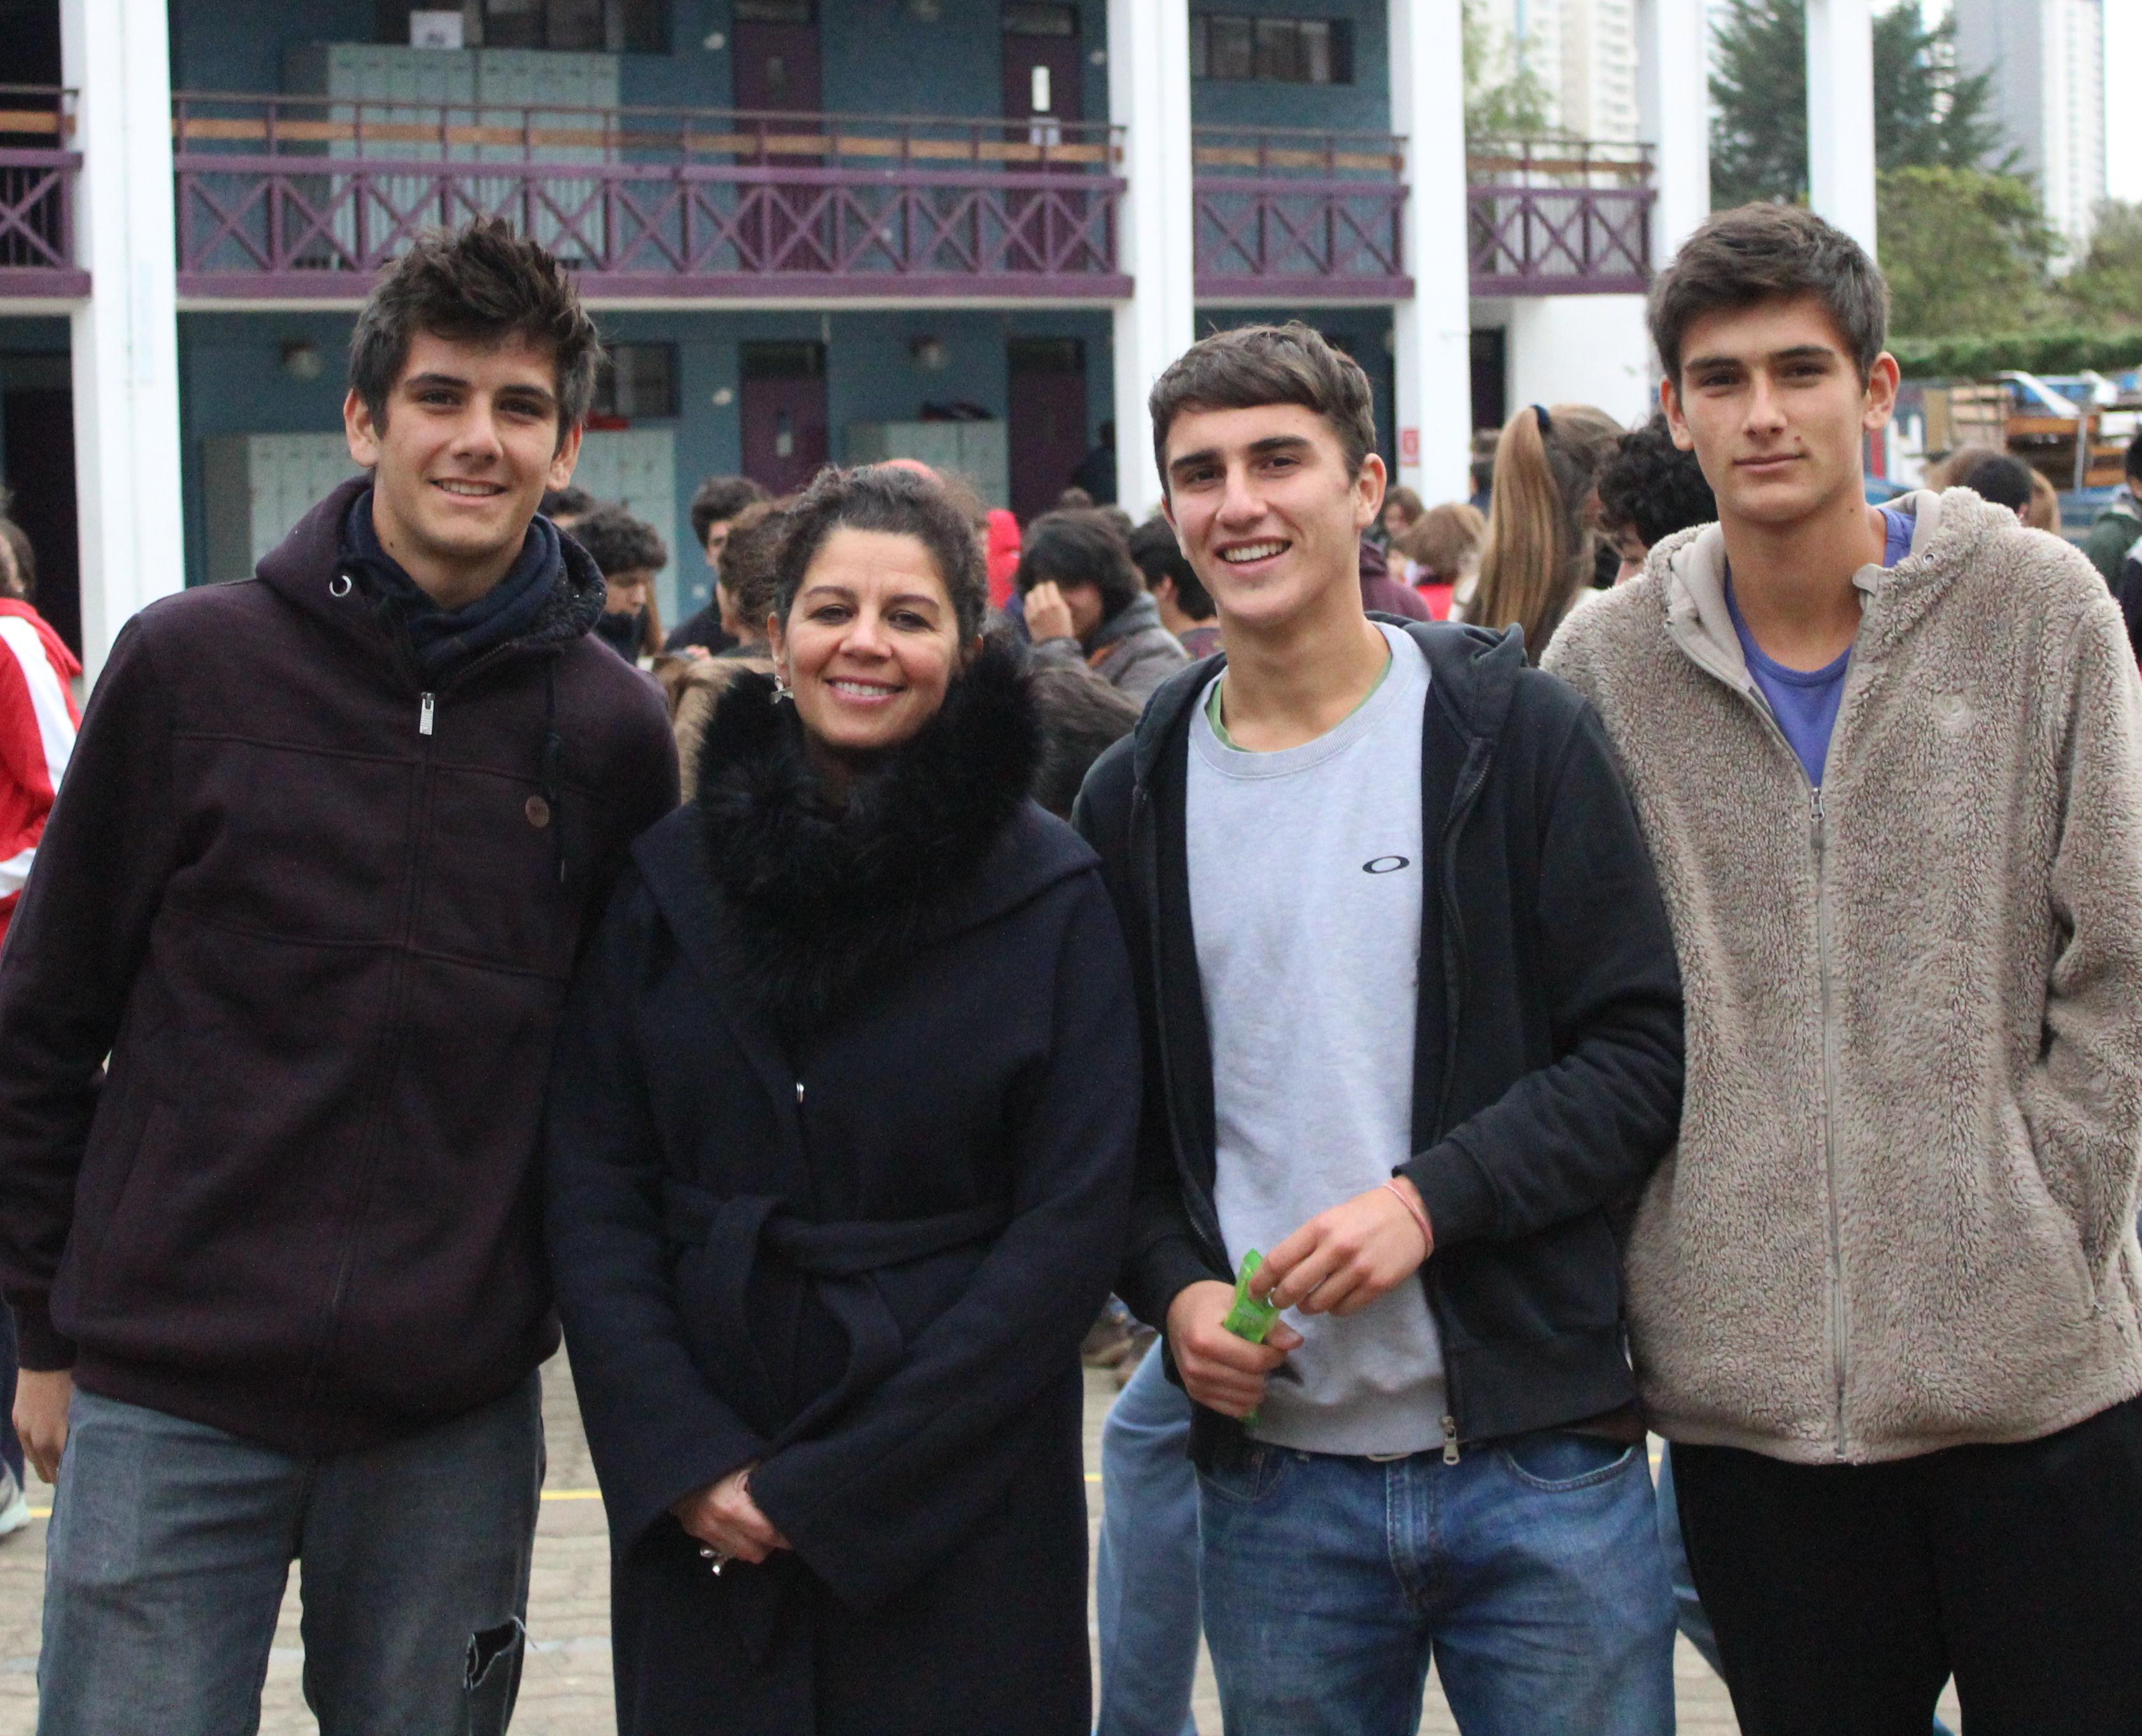 Diego Aranda, Sra. Francisca González, Vicerrectora, Diego Jiliberto y Esteban Aranda